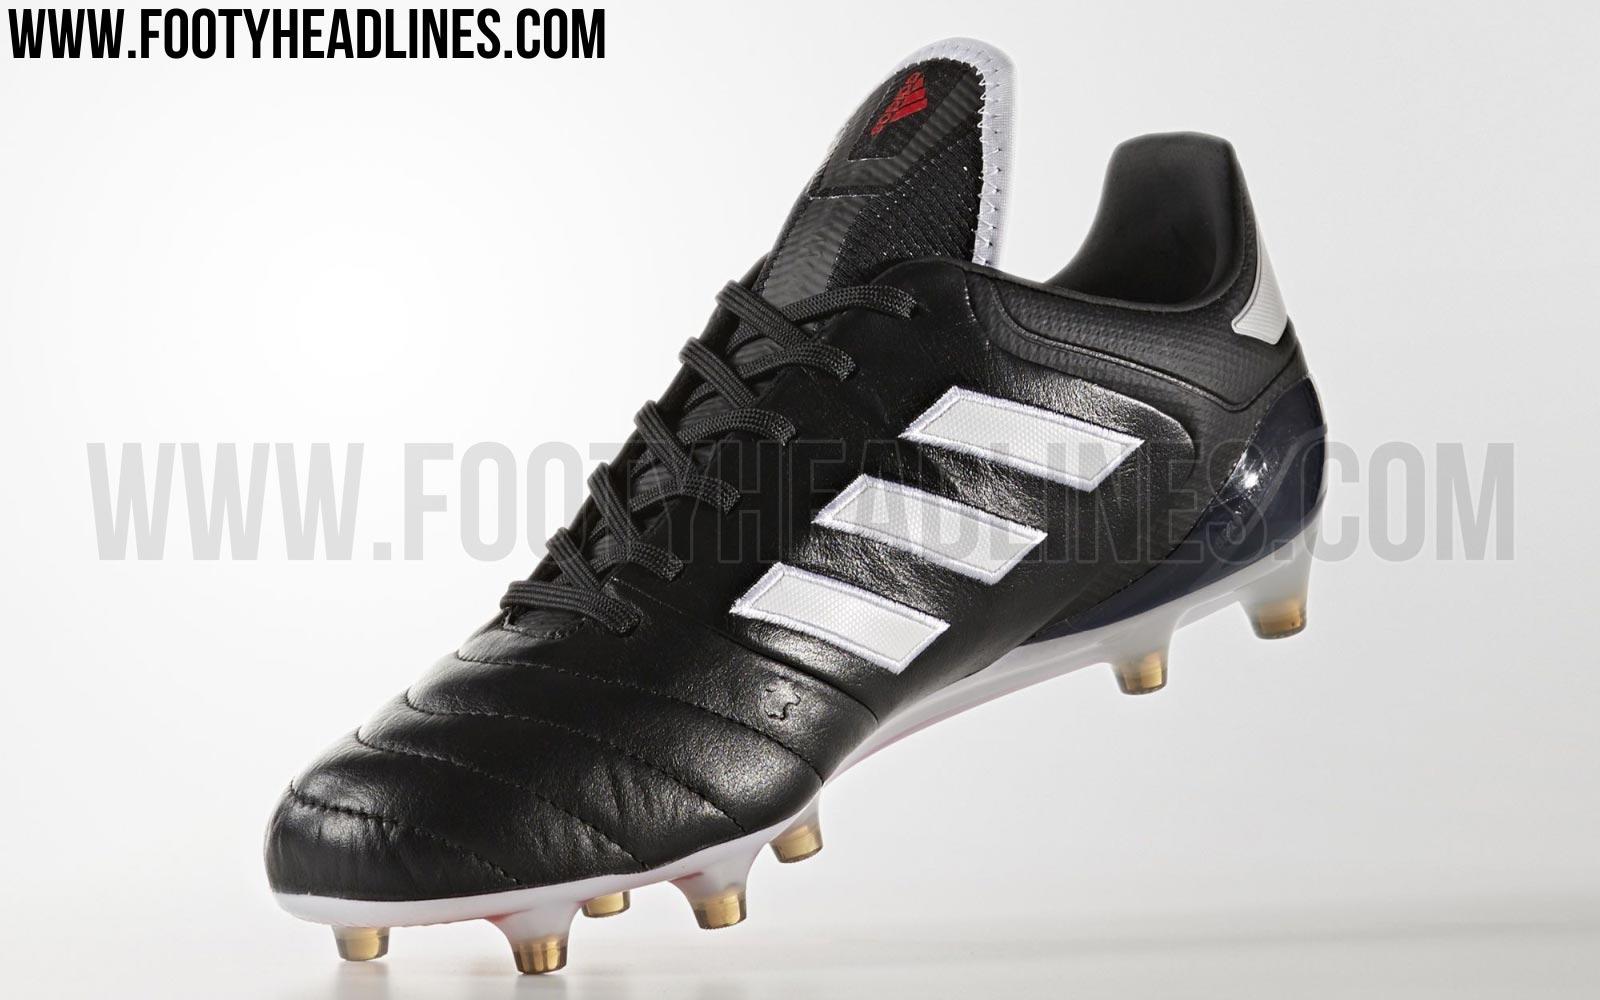 nouvelle adidas copa mundial